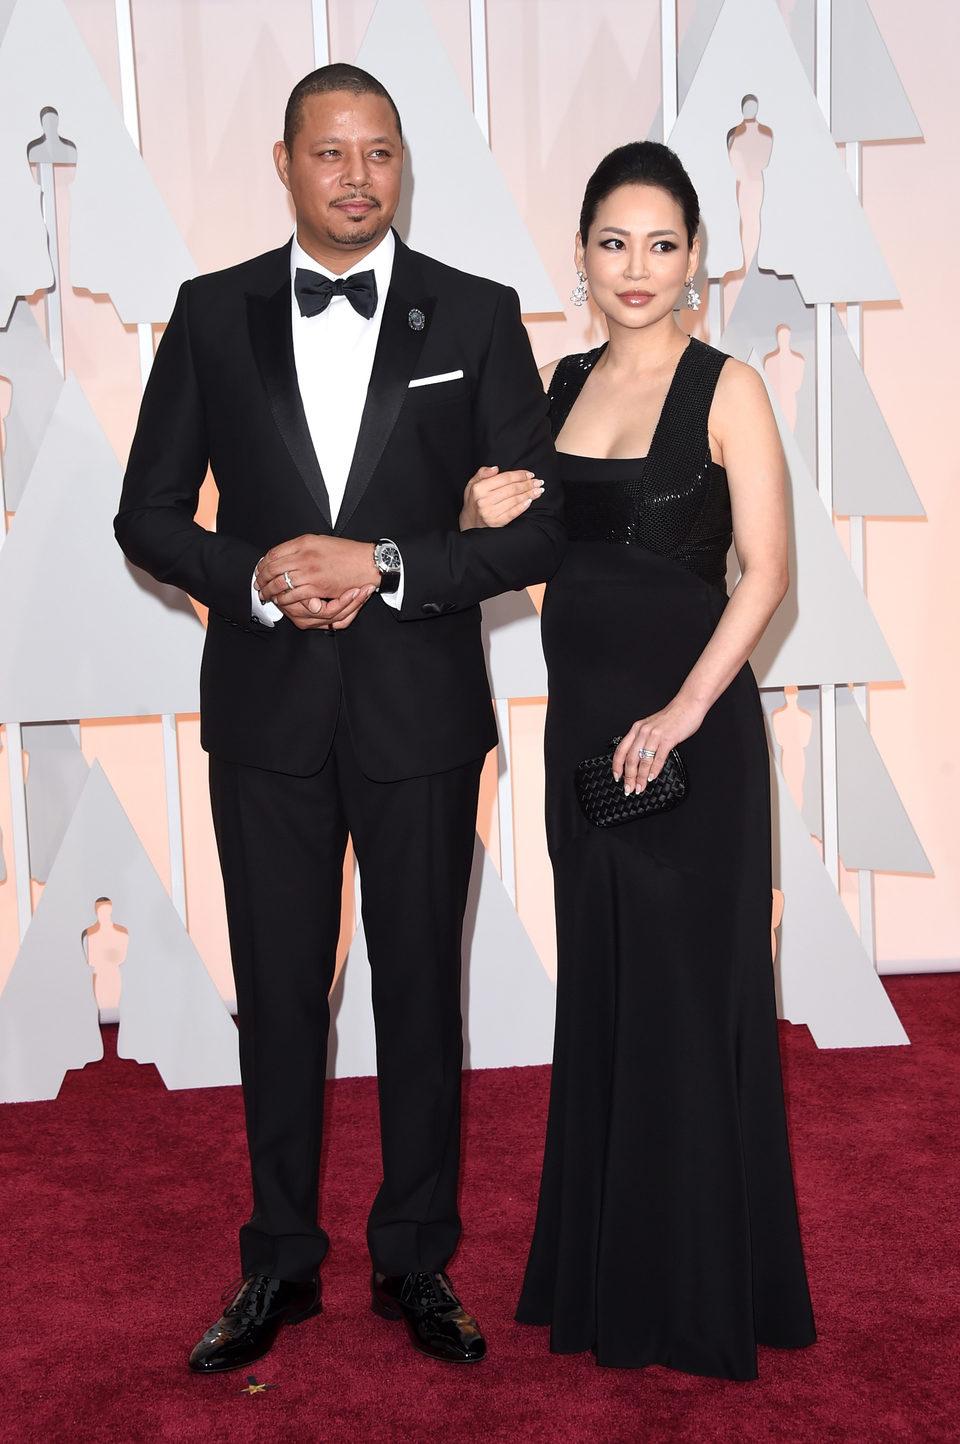 Terrence Howard and Miranda Howard in the Oscar 2015 red carpet